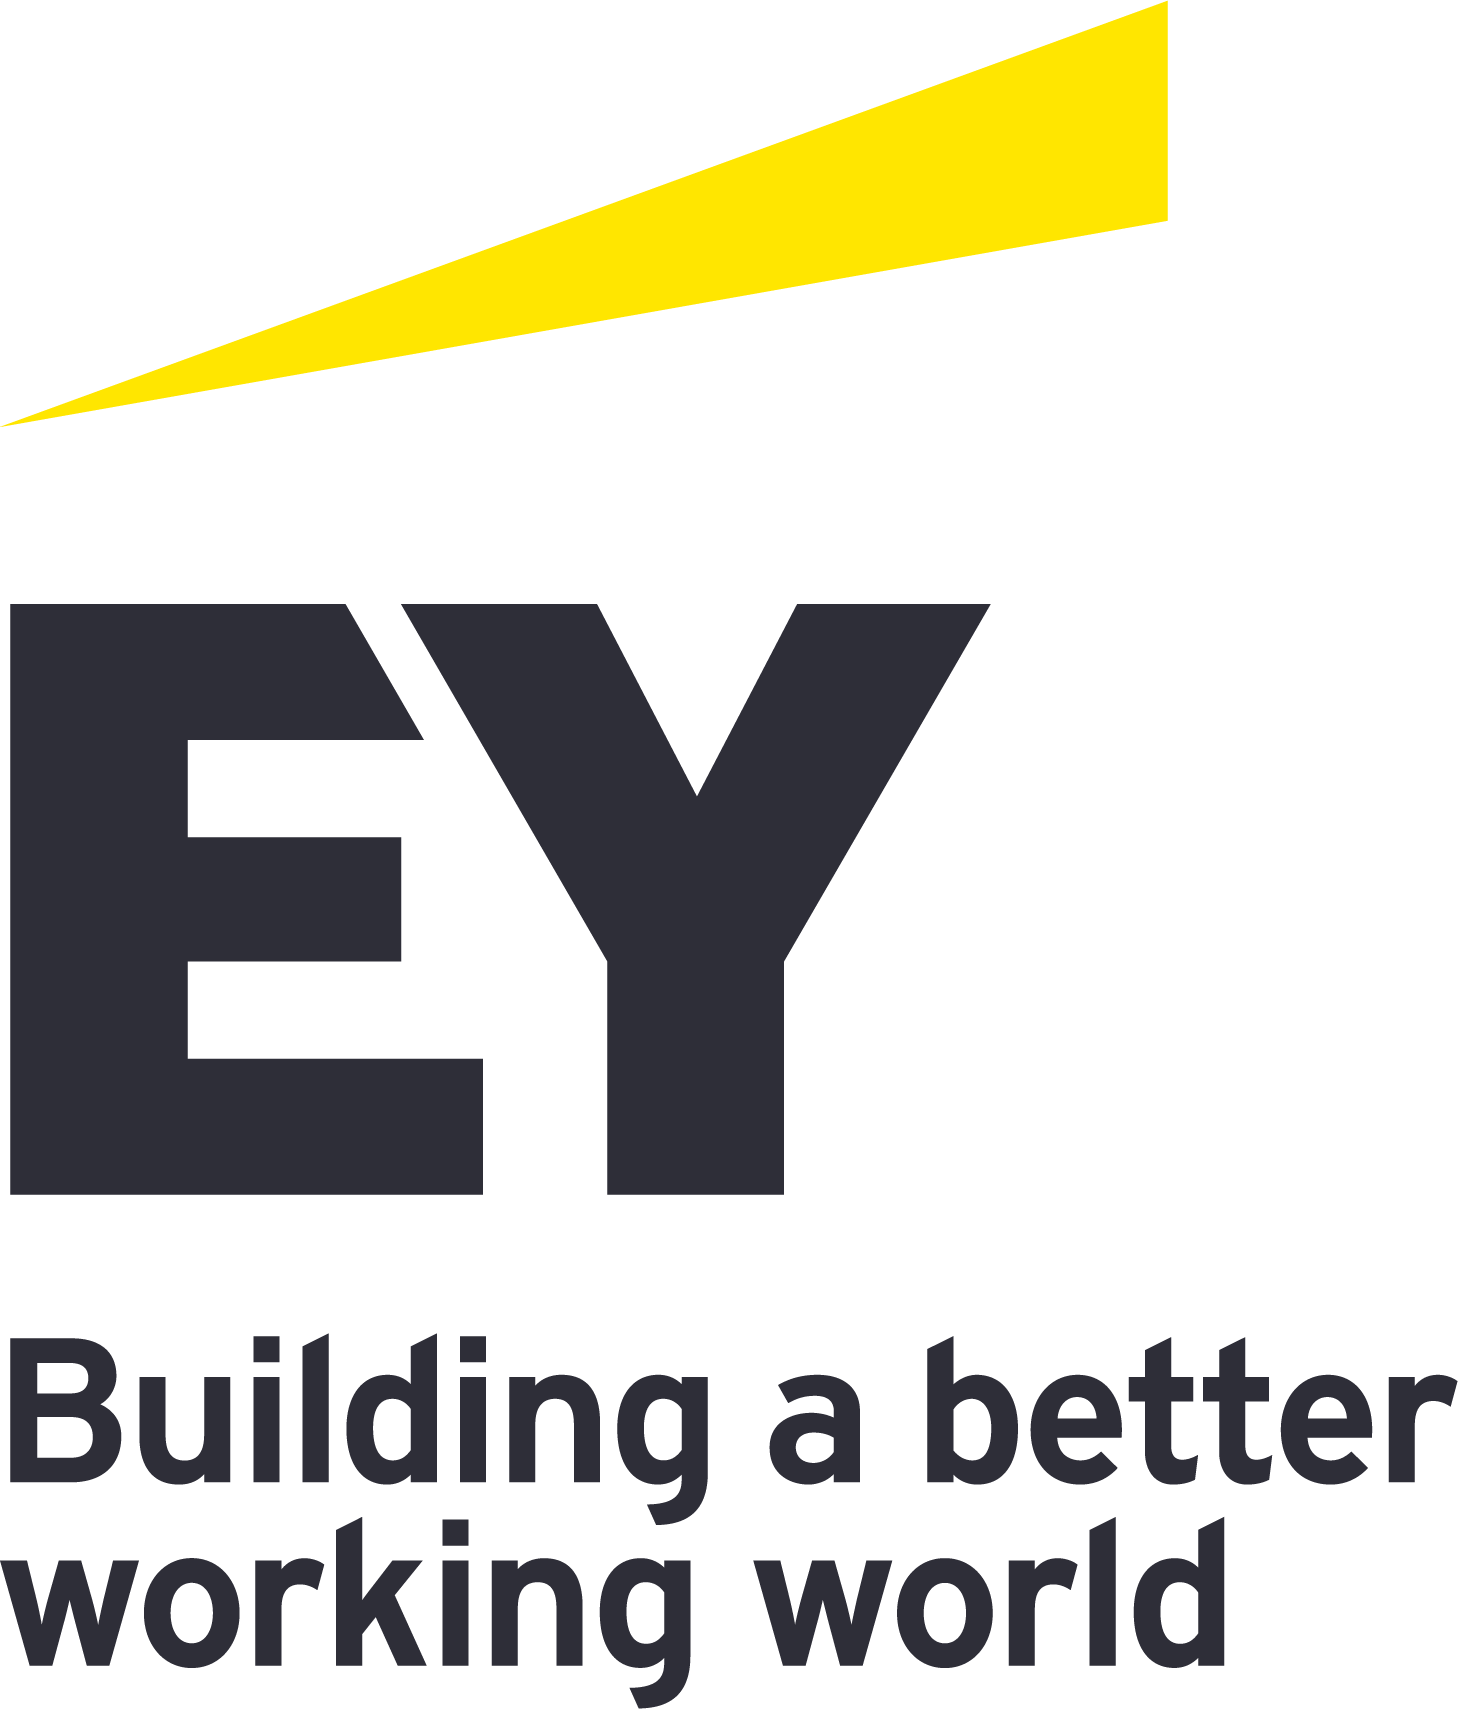 EY_Logo_Beam_Tag_Stacked_RGB_OffBlack_Yellow.png